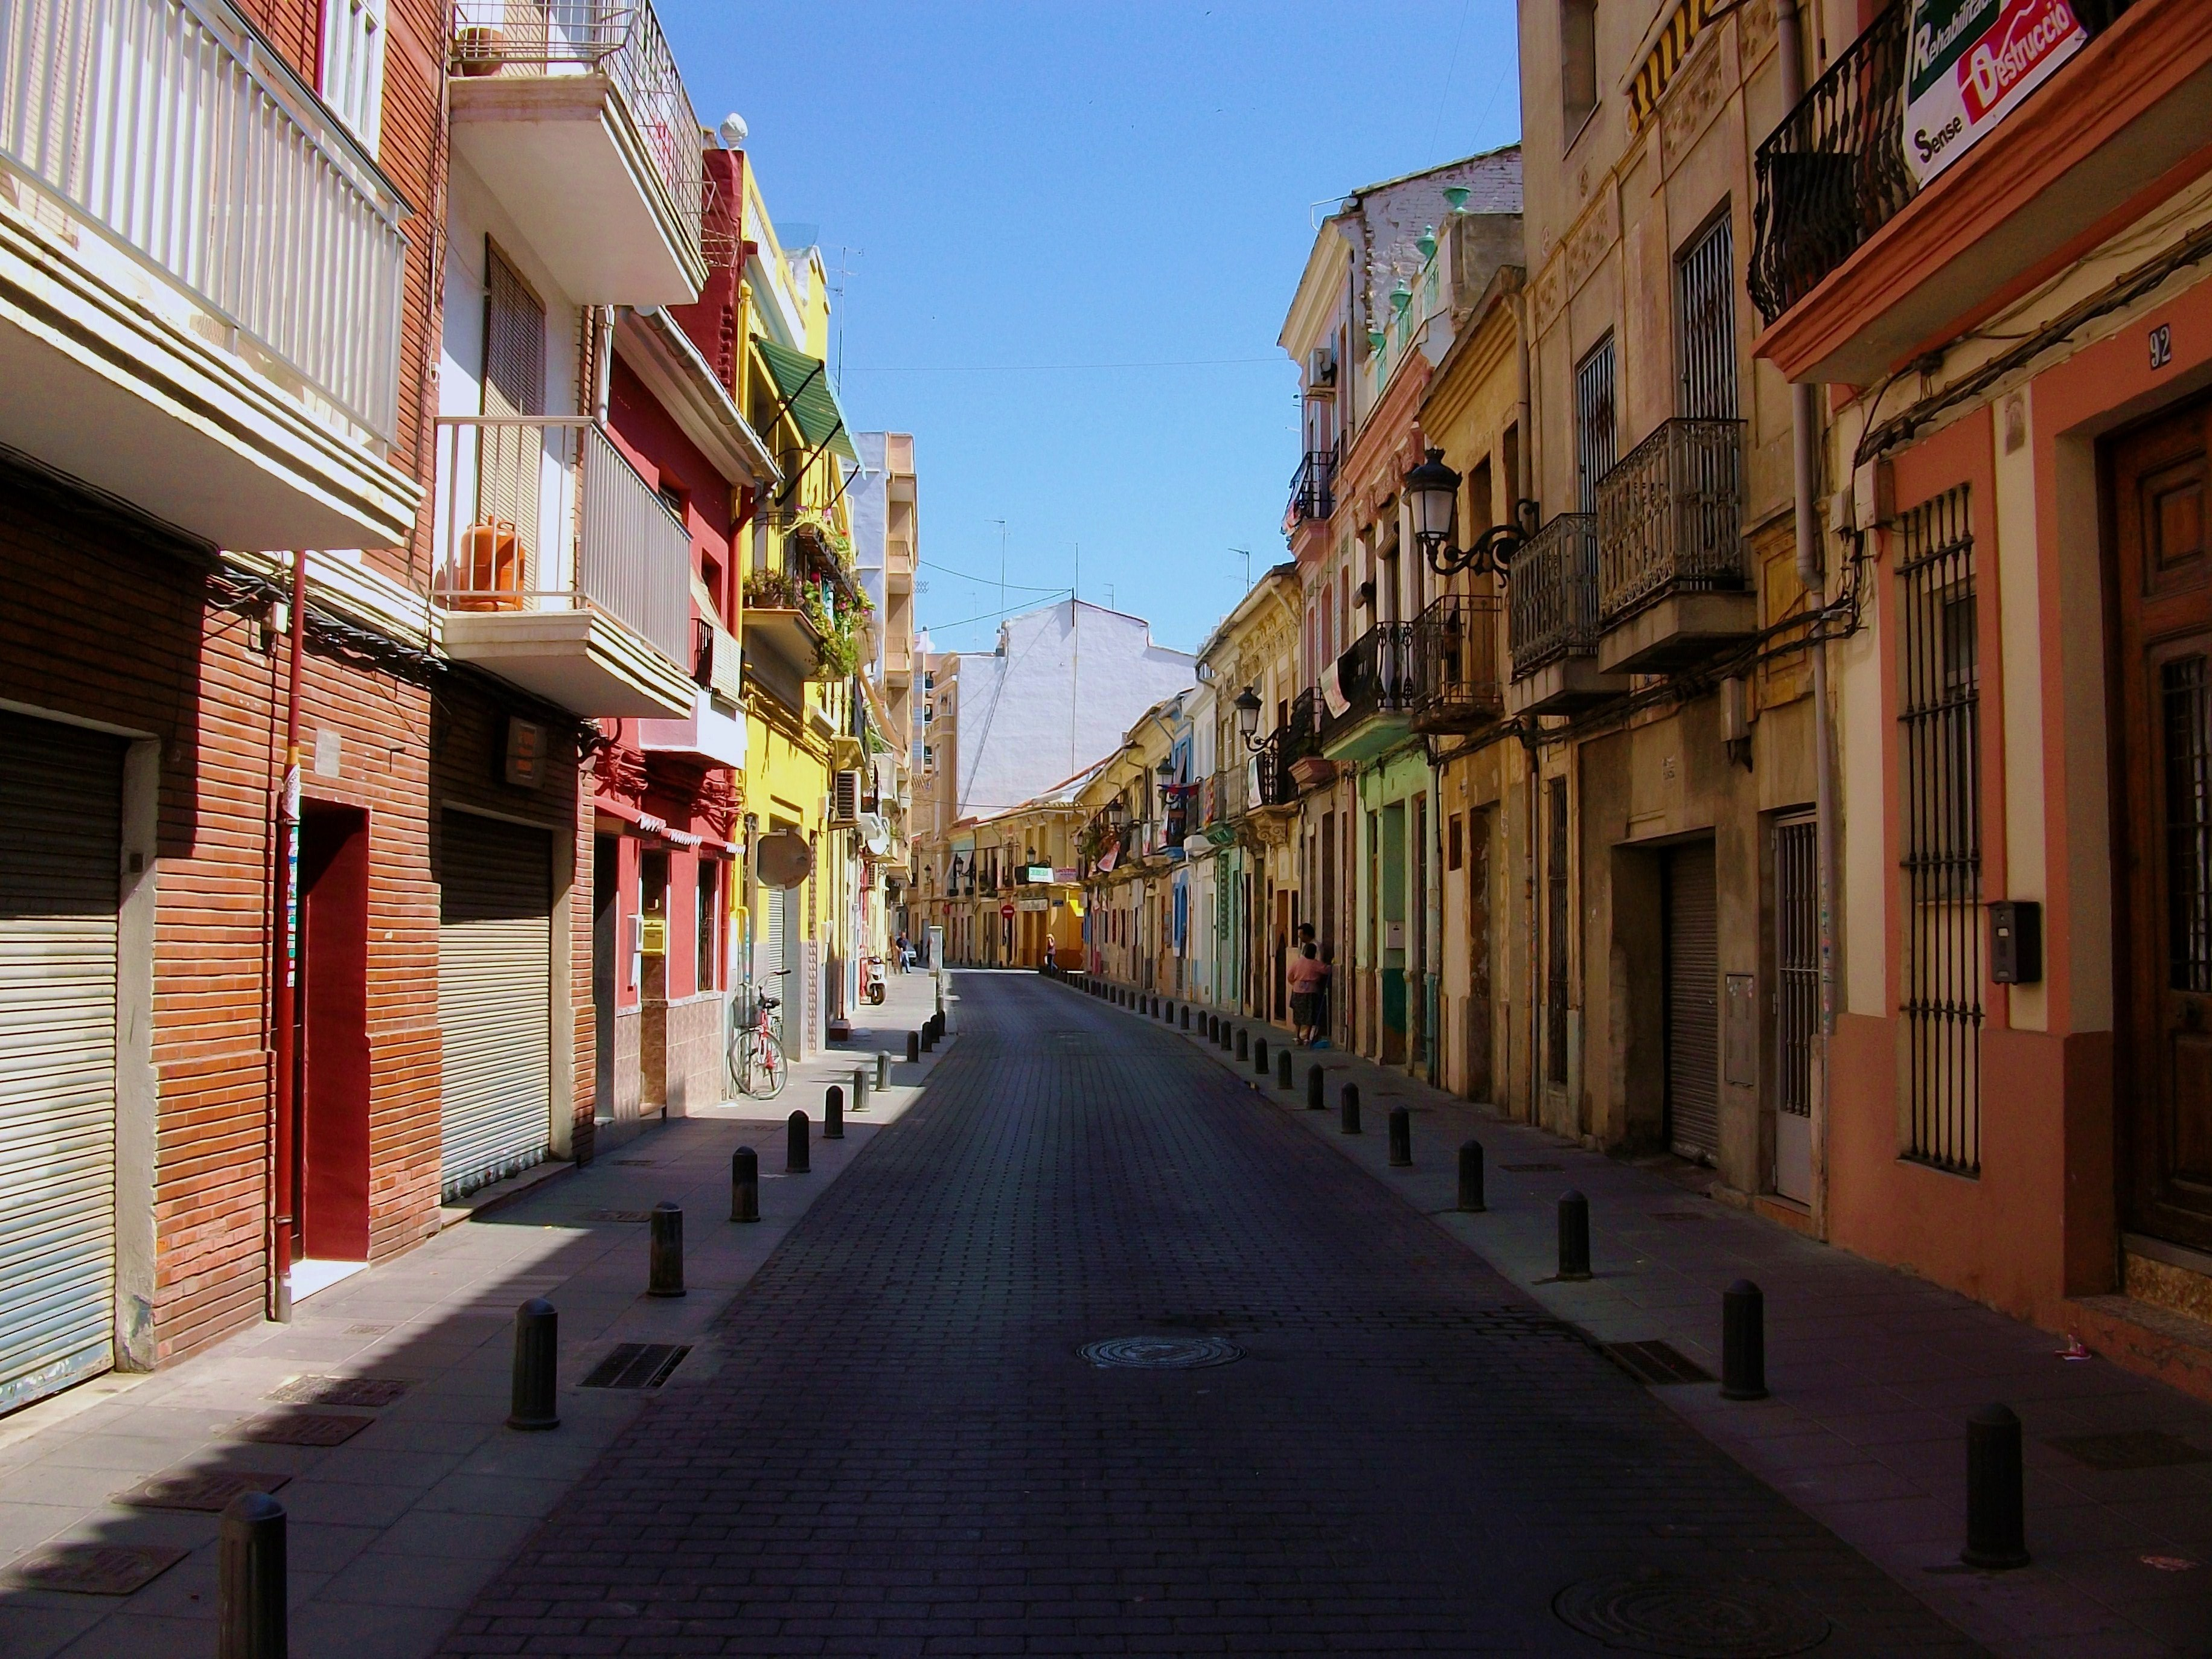 Barrio del Cabanyal, en Valencia | Foto: Joanbanjo en Wikimedia Commons